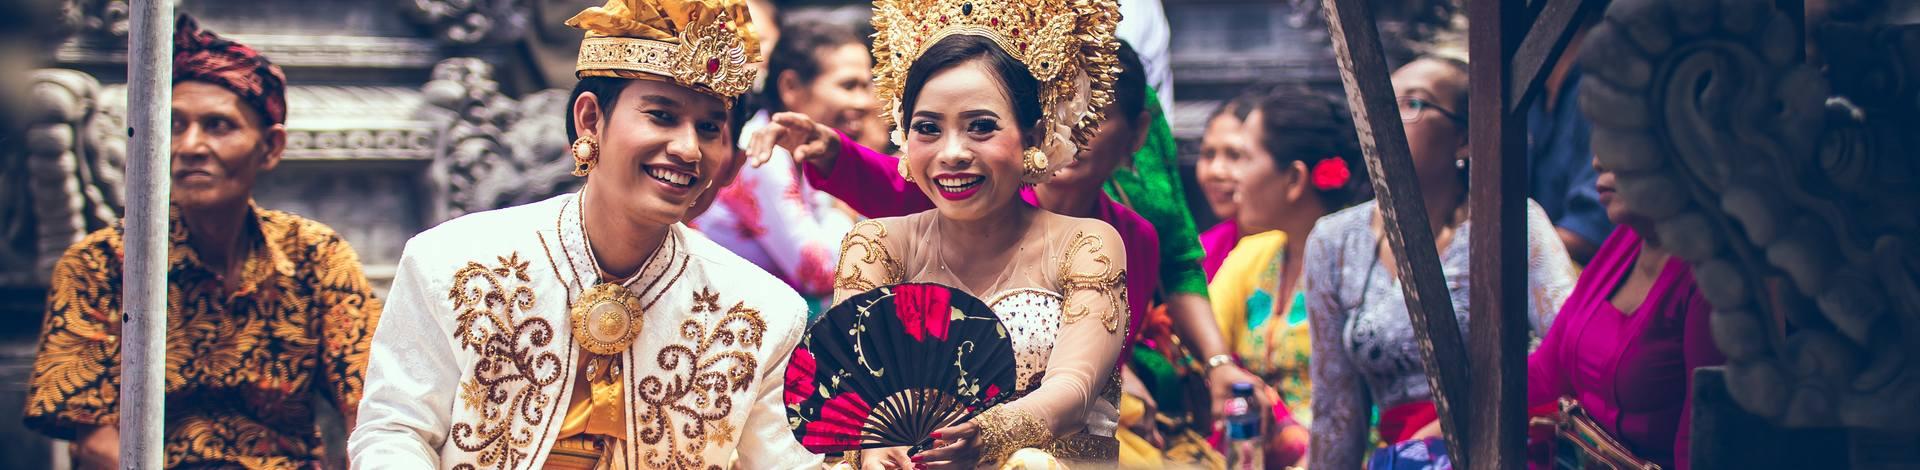 Voyage noces mariage traditionnel Lune miel Bali Lombok